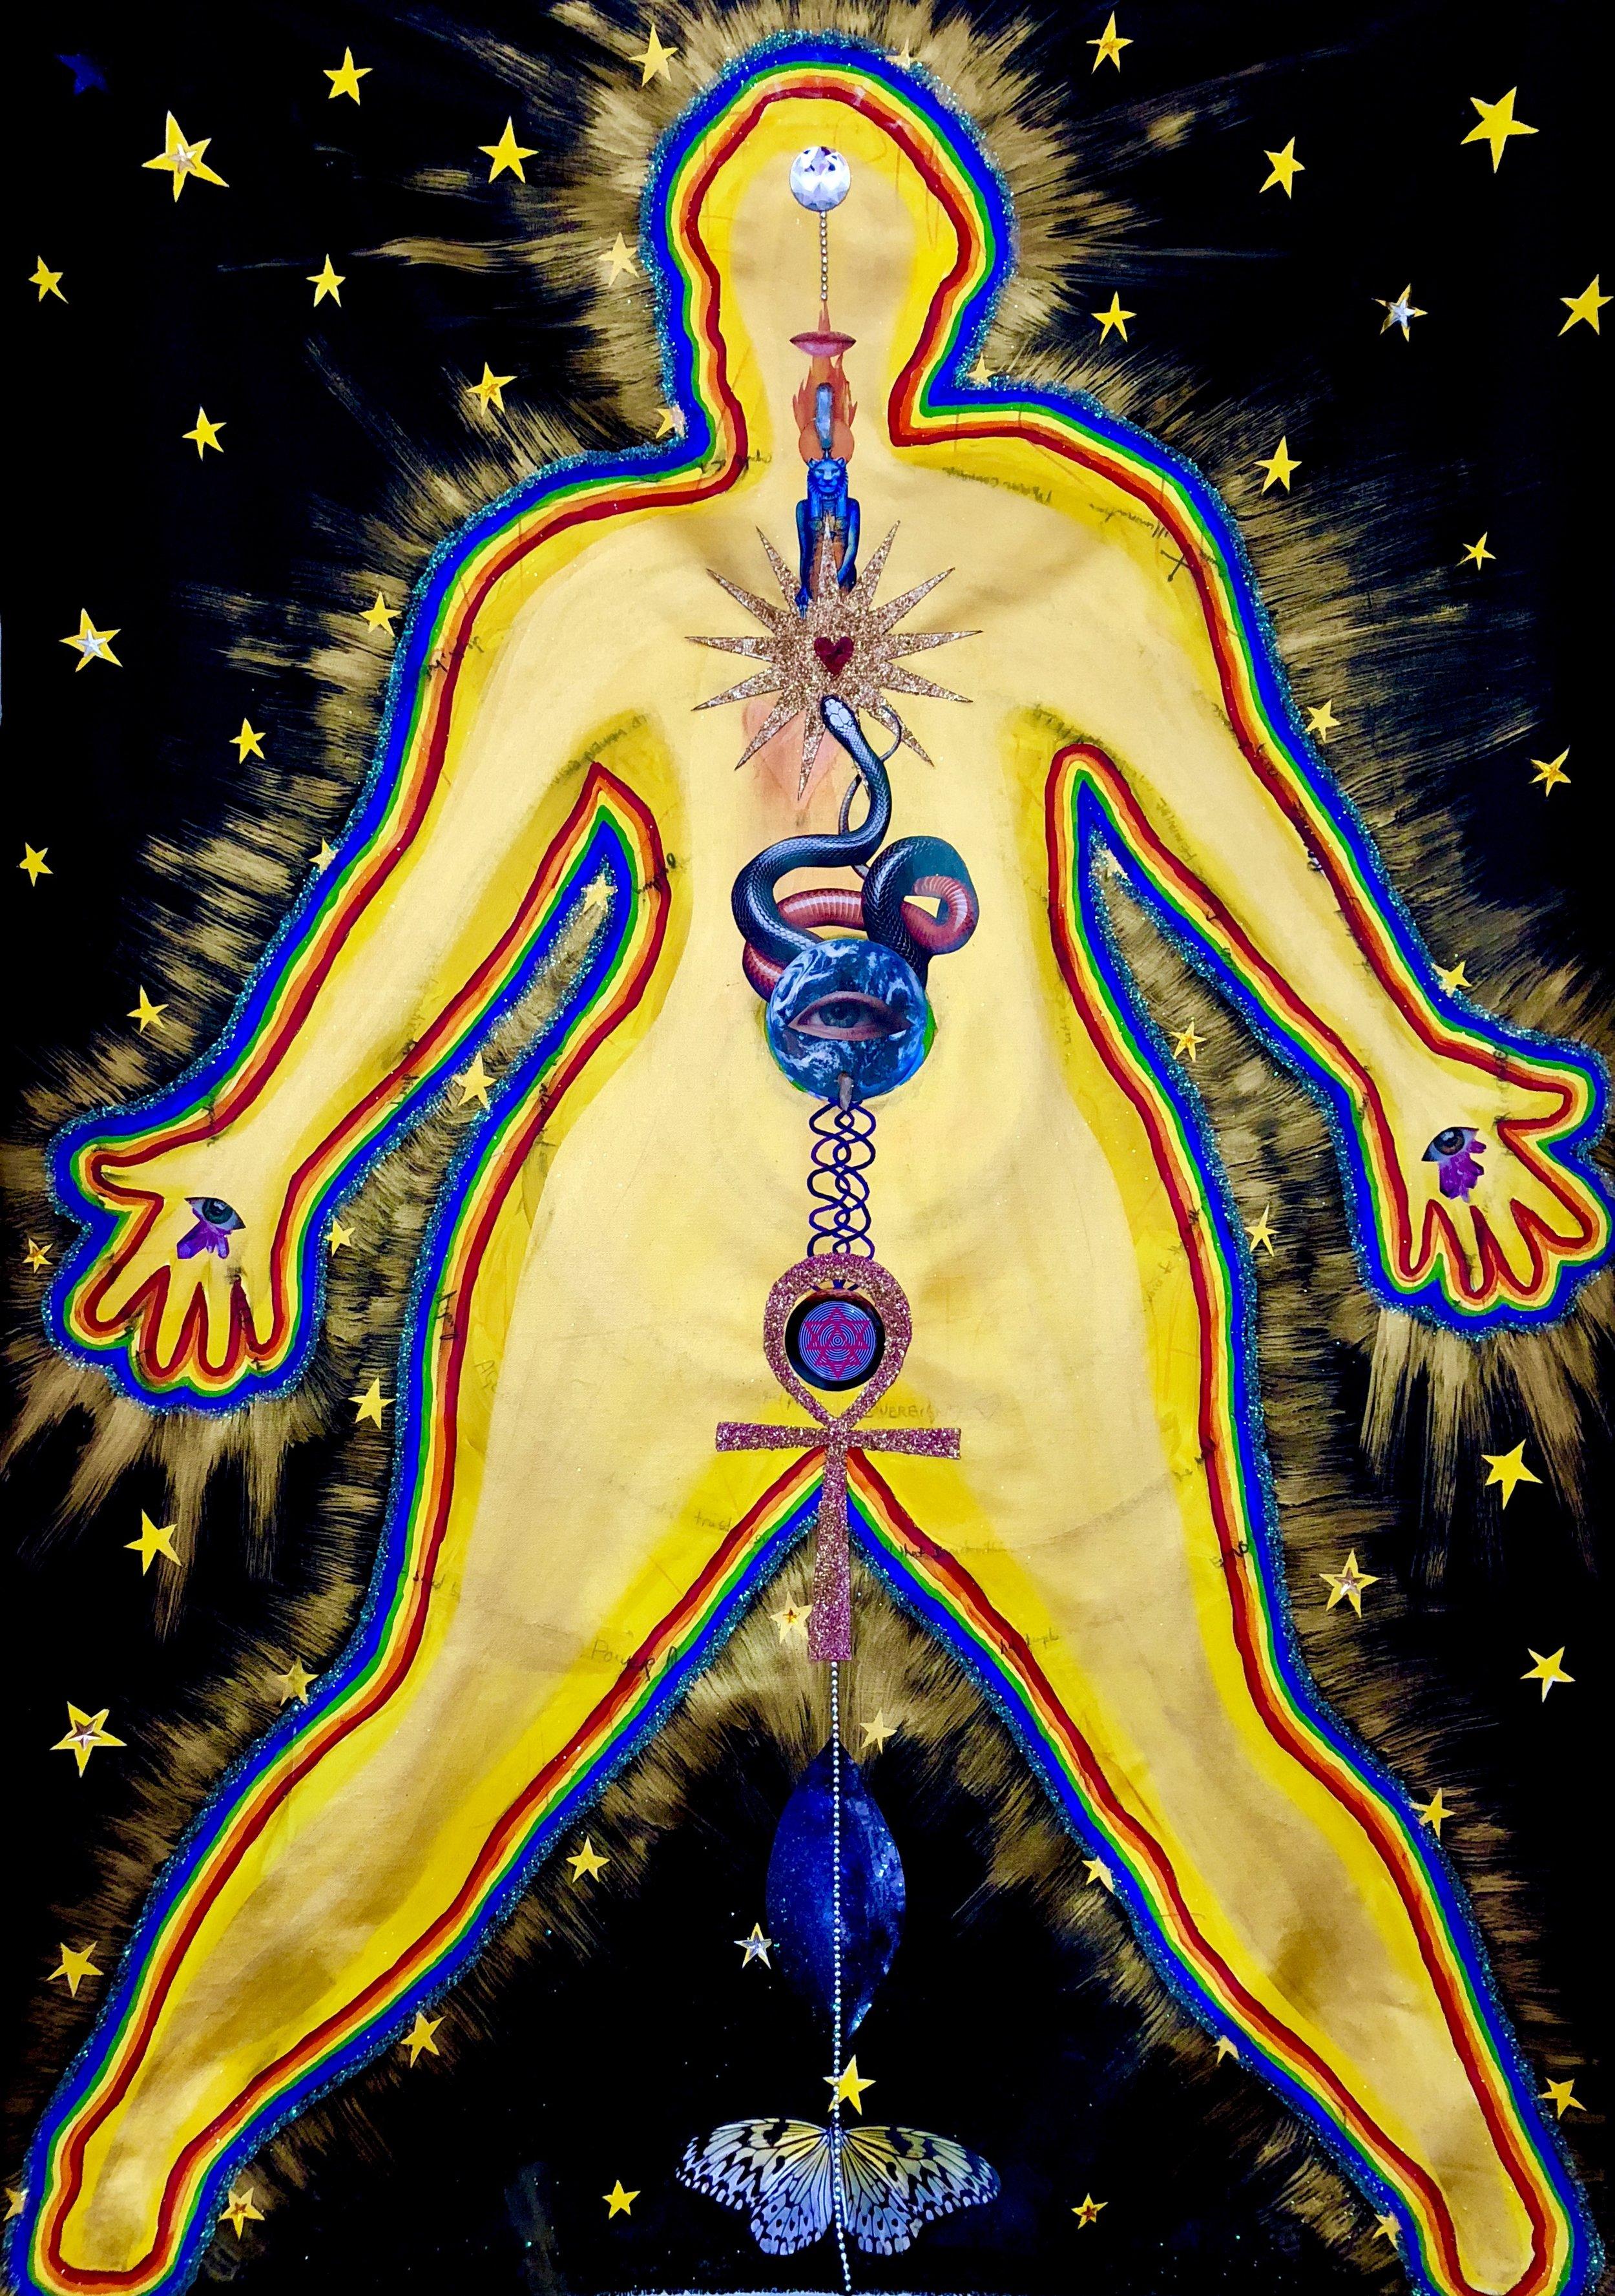 5 foot mixed media Shamanic Healing he(art) work